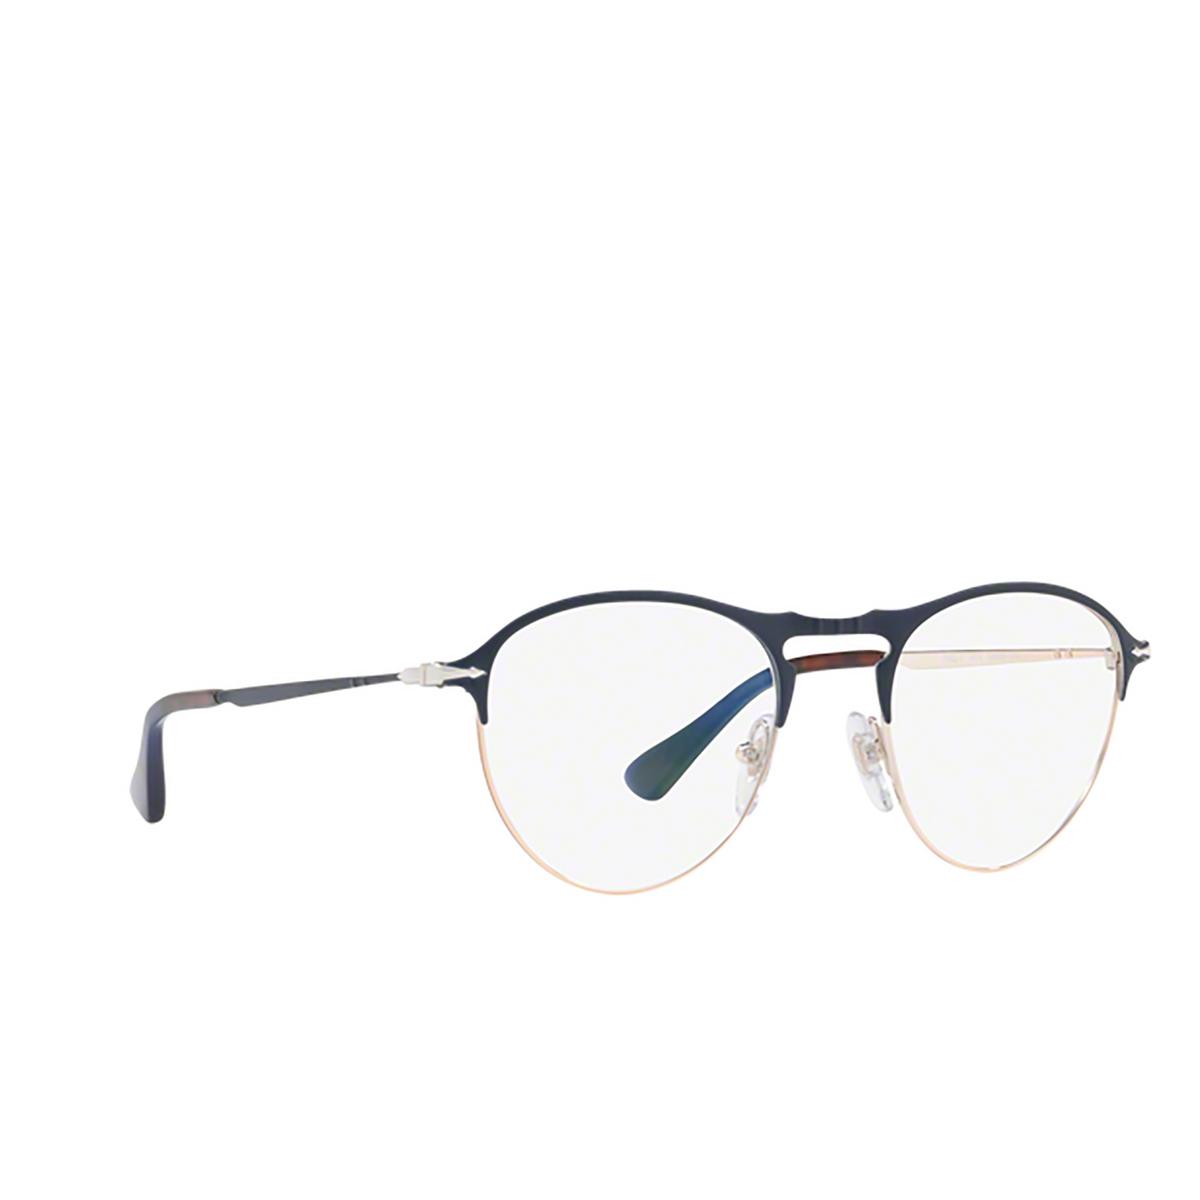 Persol® Round Eyeglasses: PO7092V color Blue / Bronze 1073 - three-quarters view.